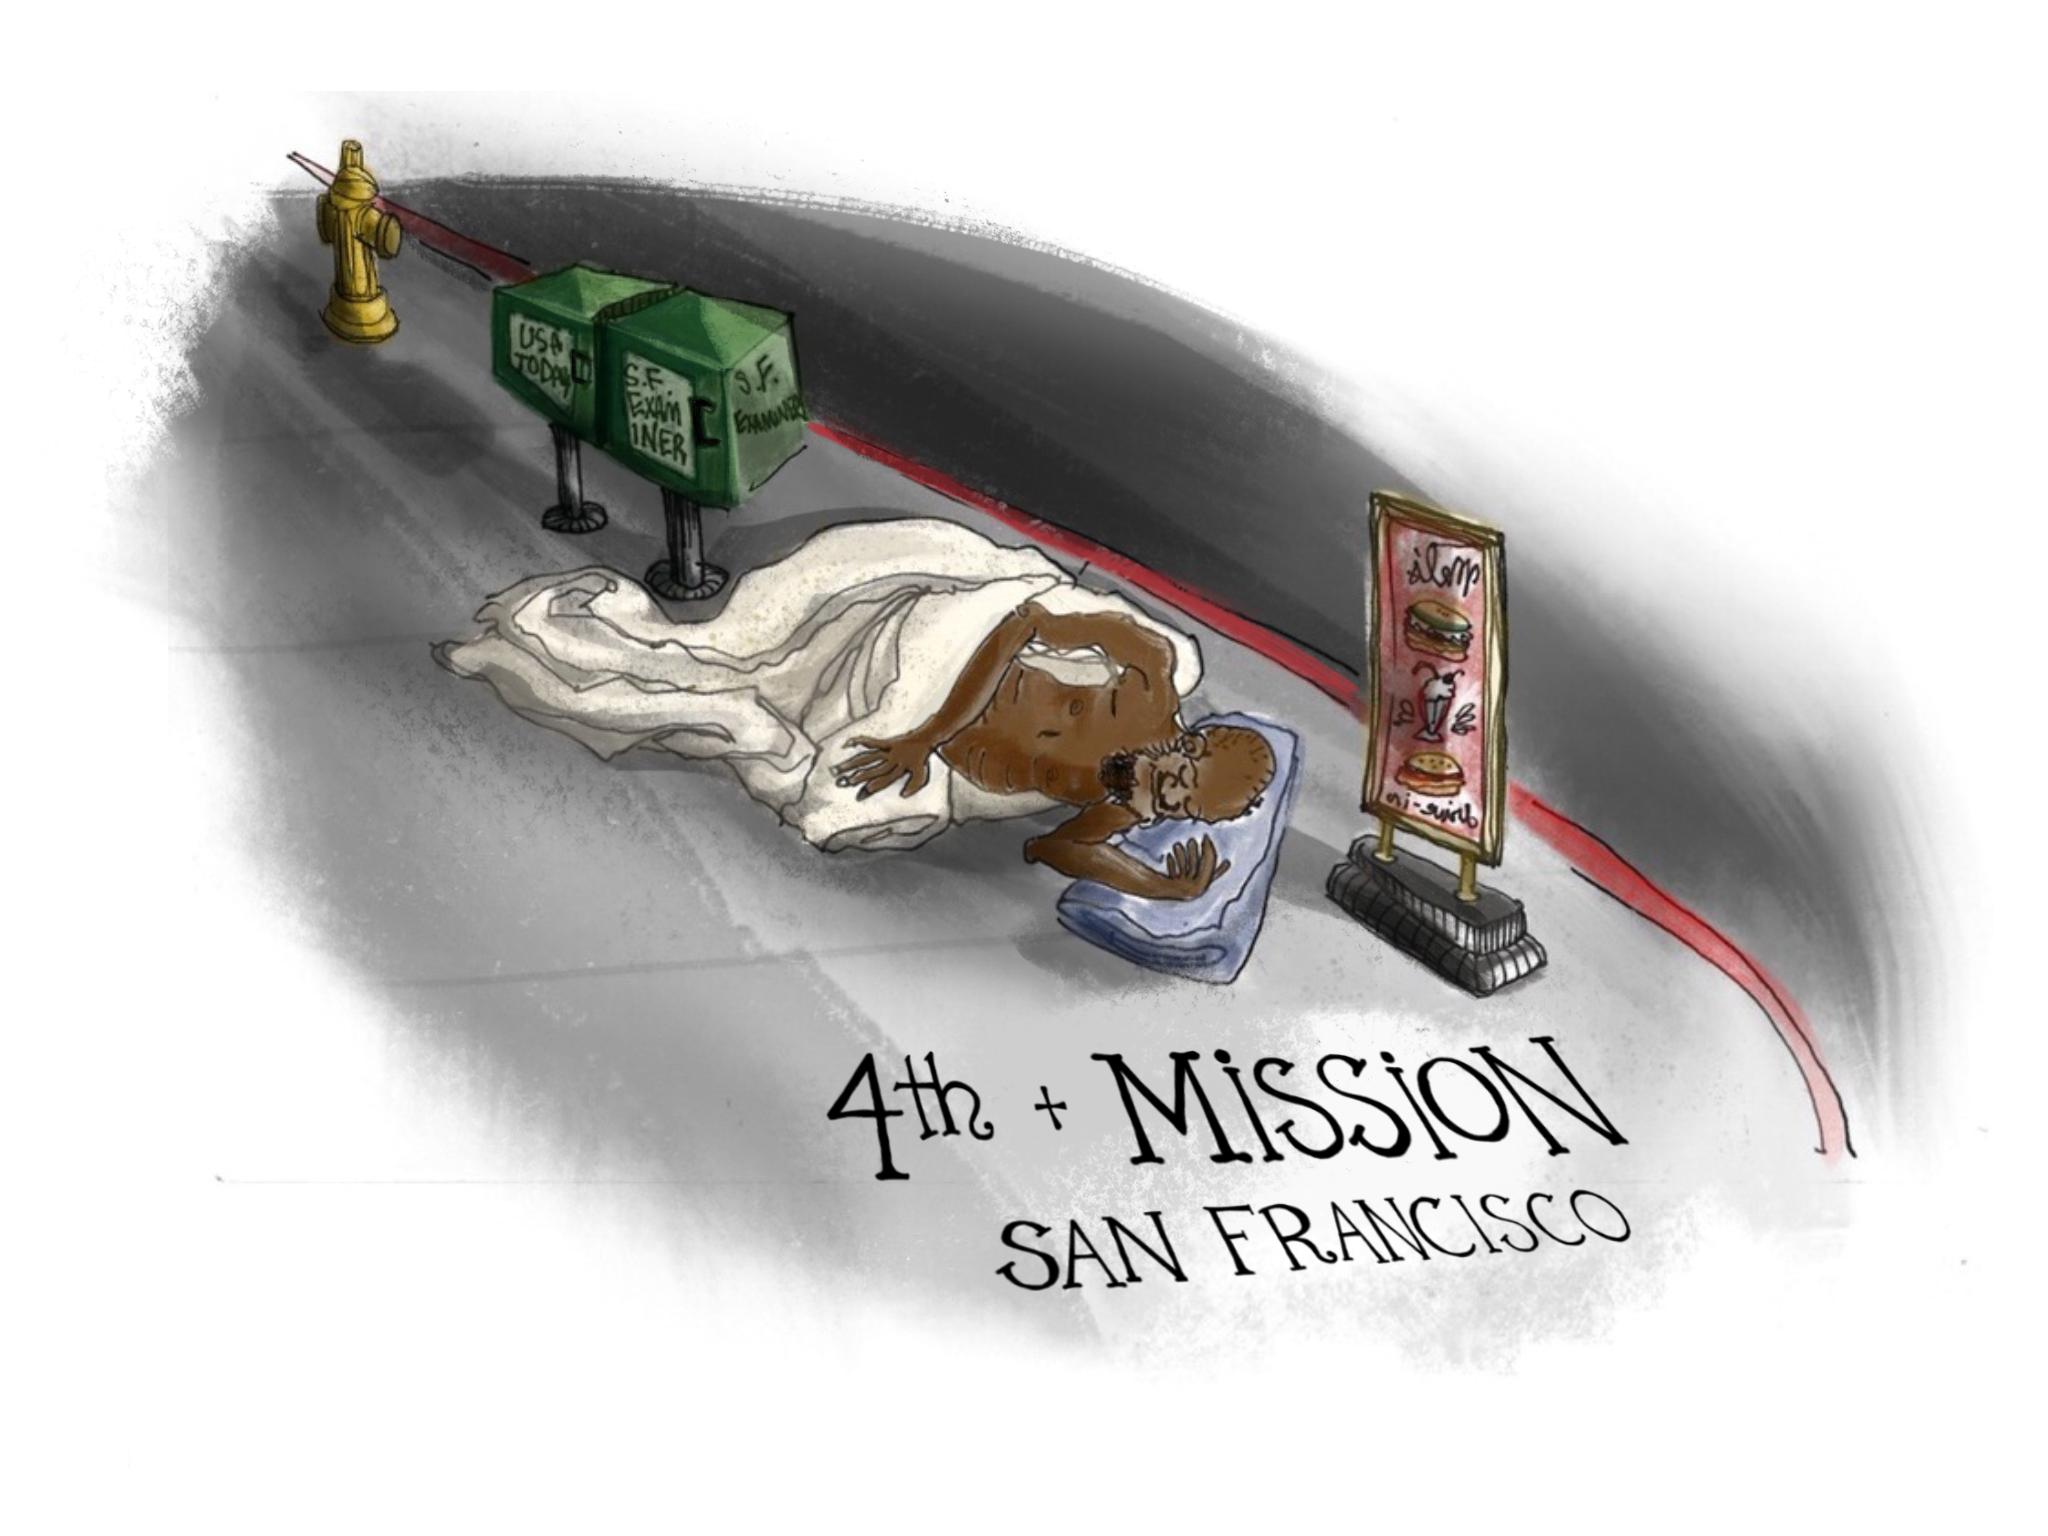 4th + Mission